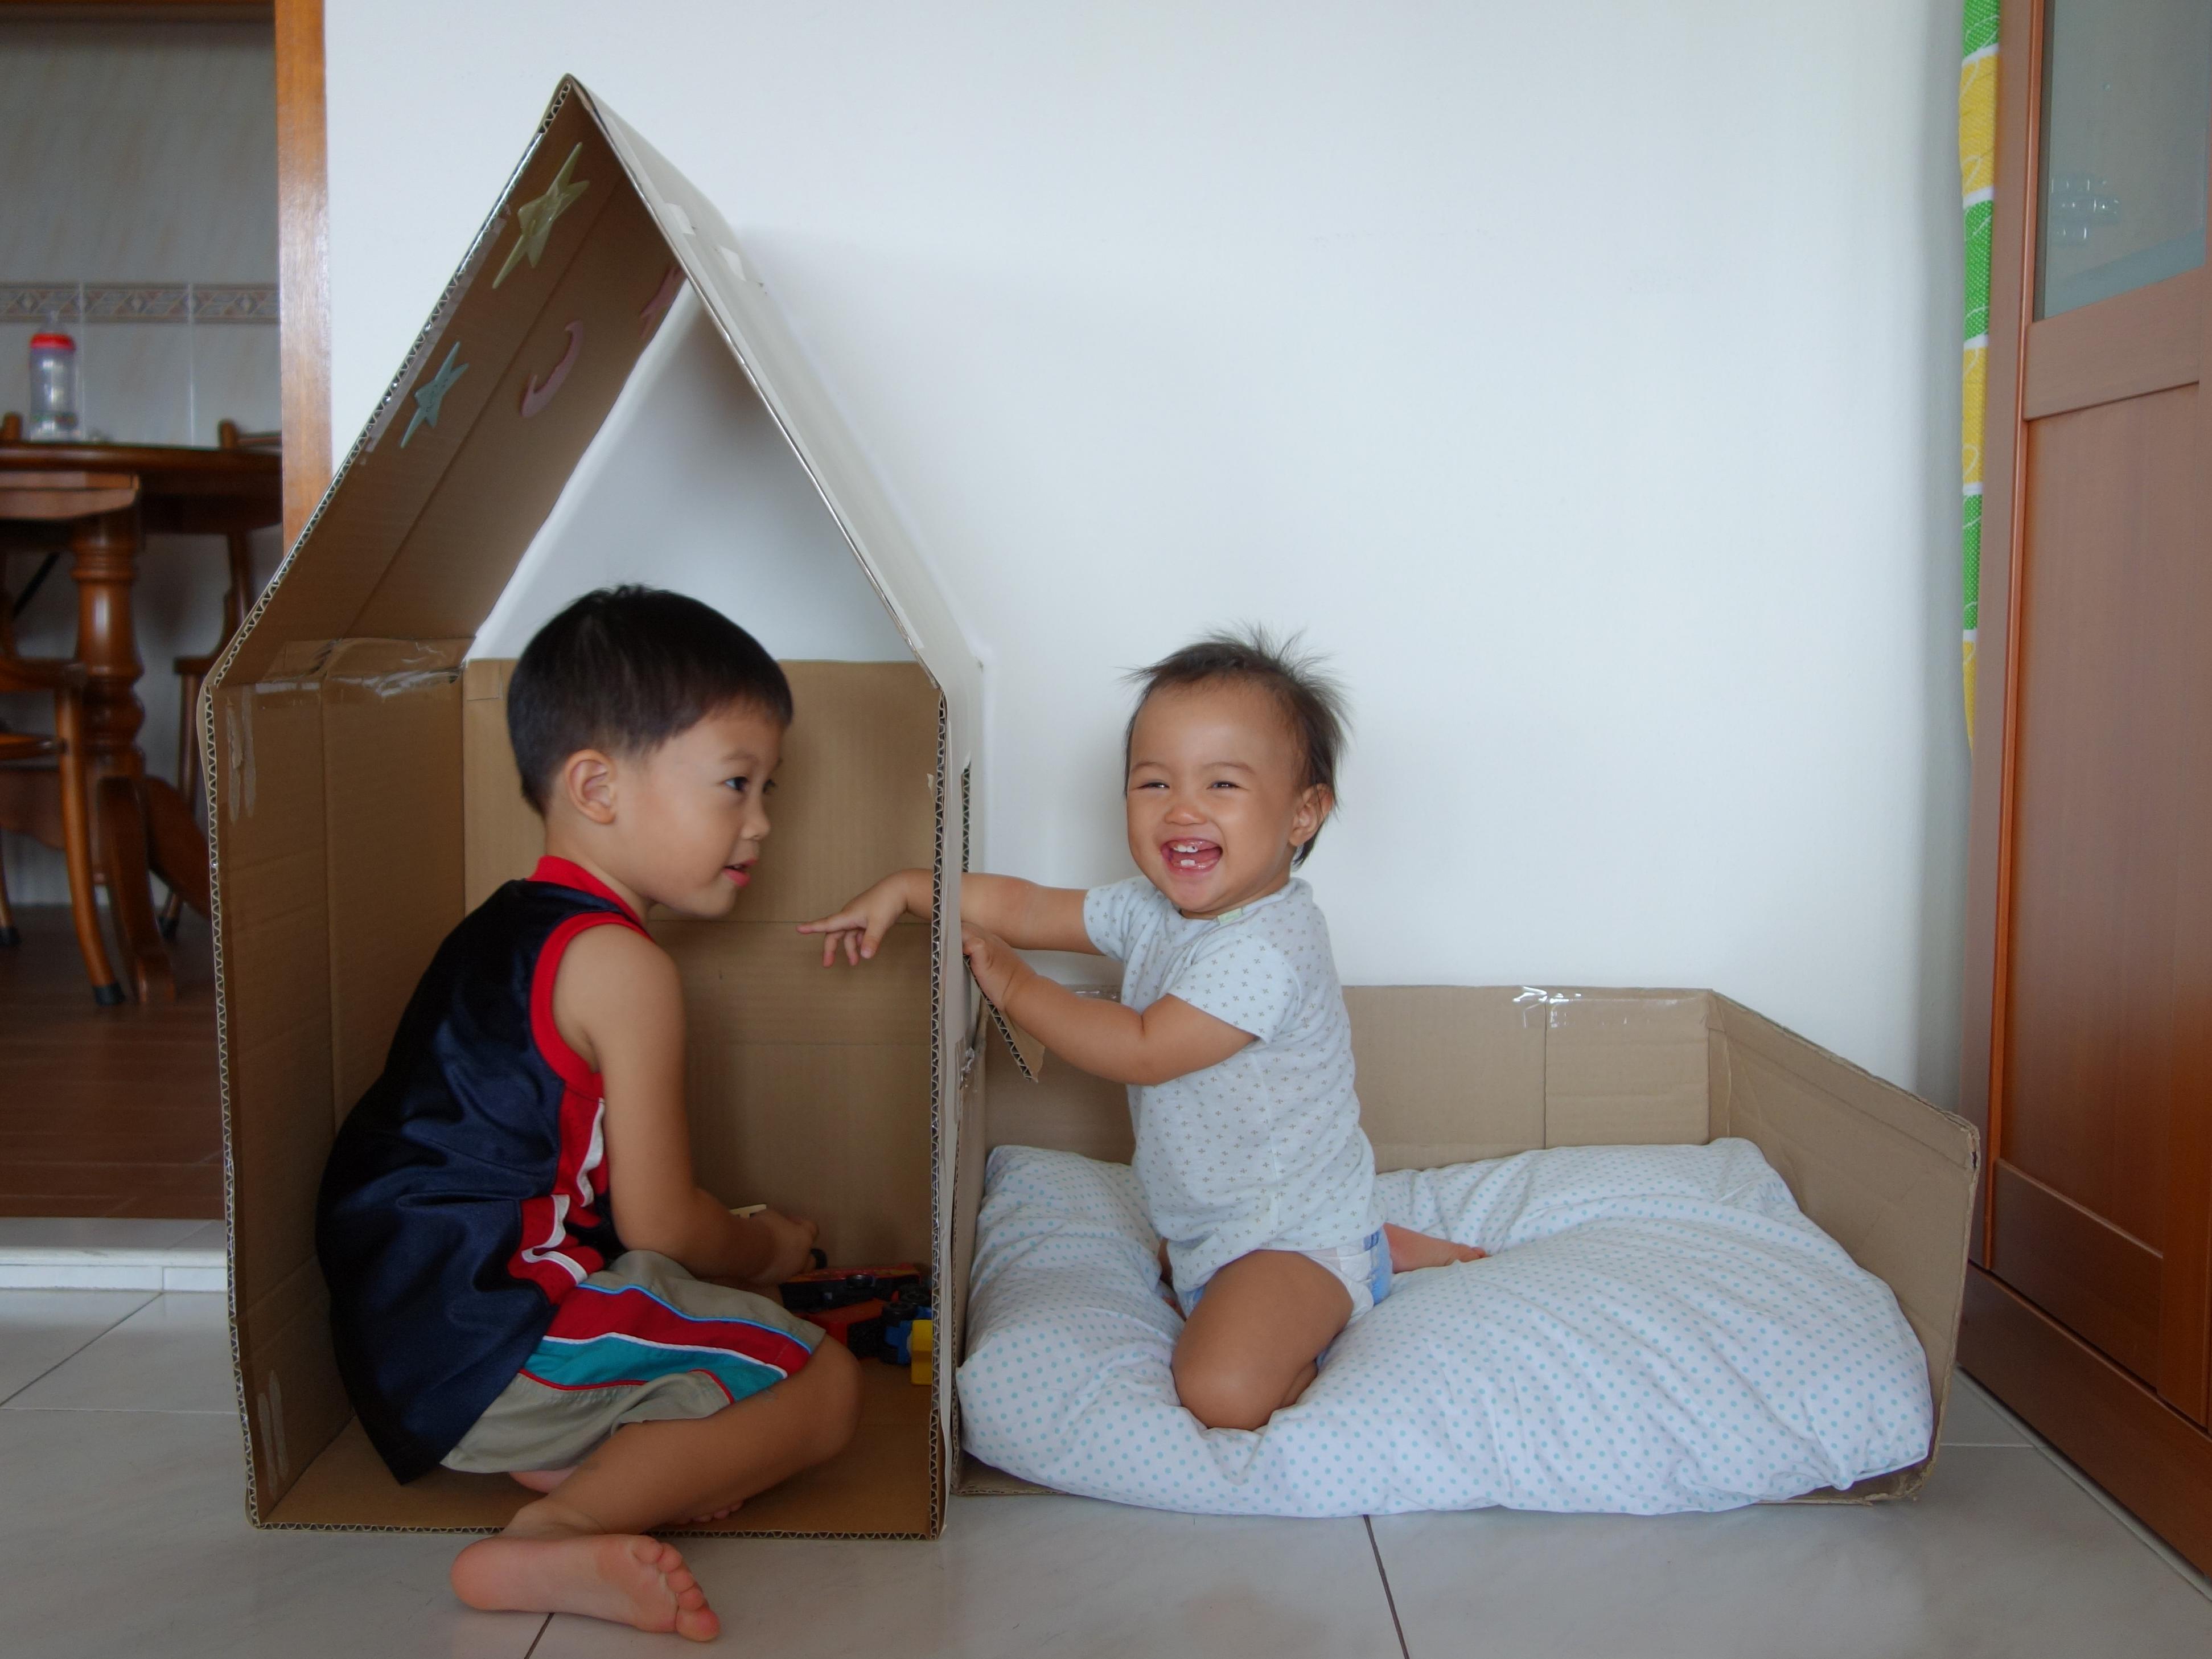 Playing house diy kid - Dsc01280